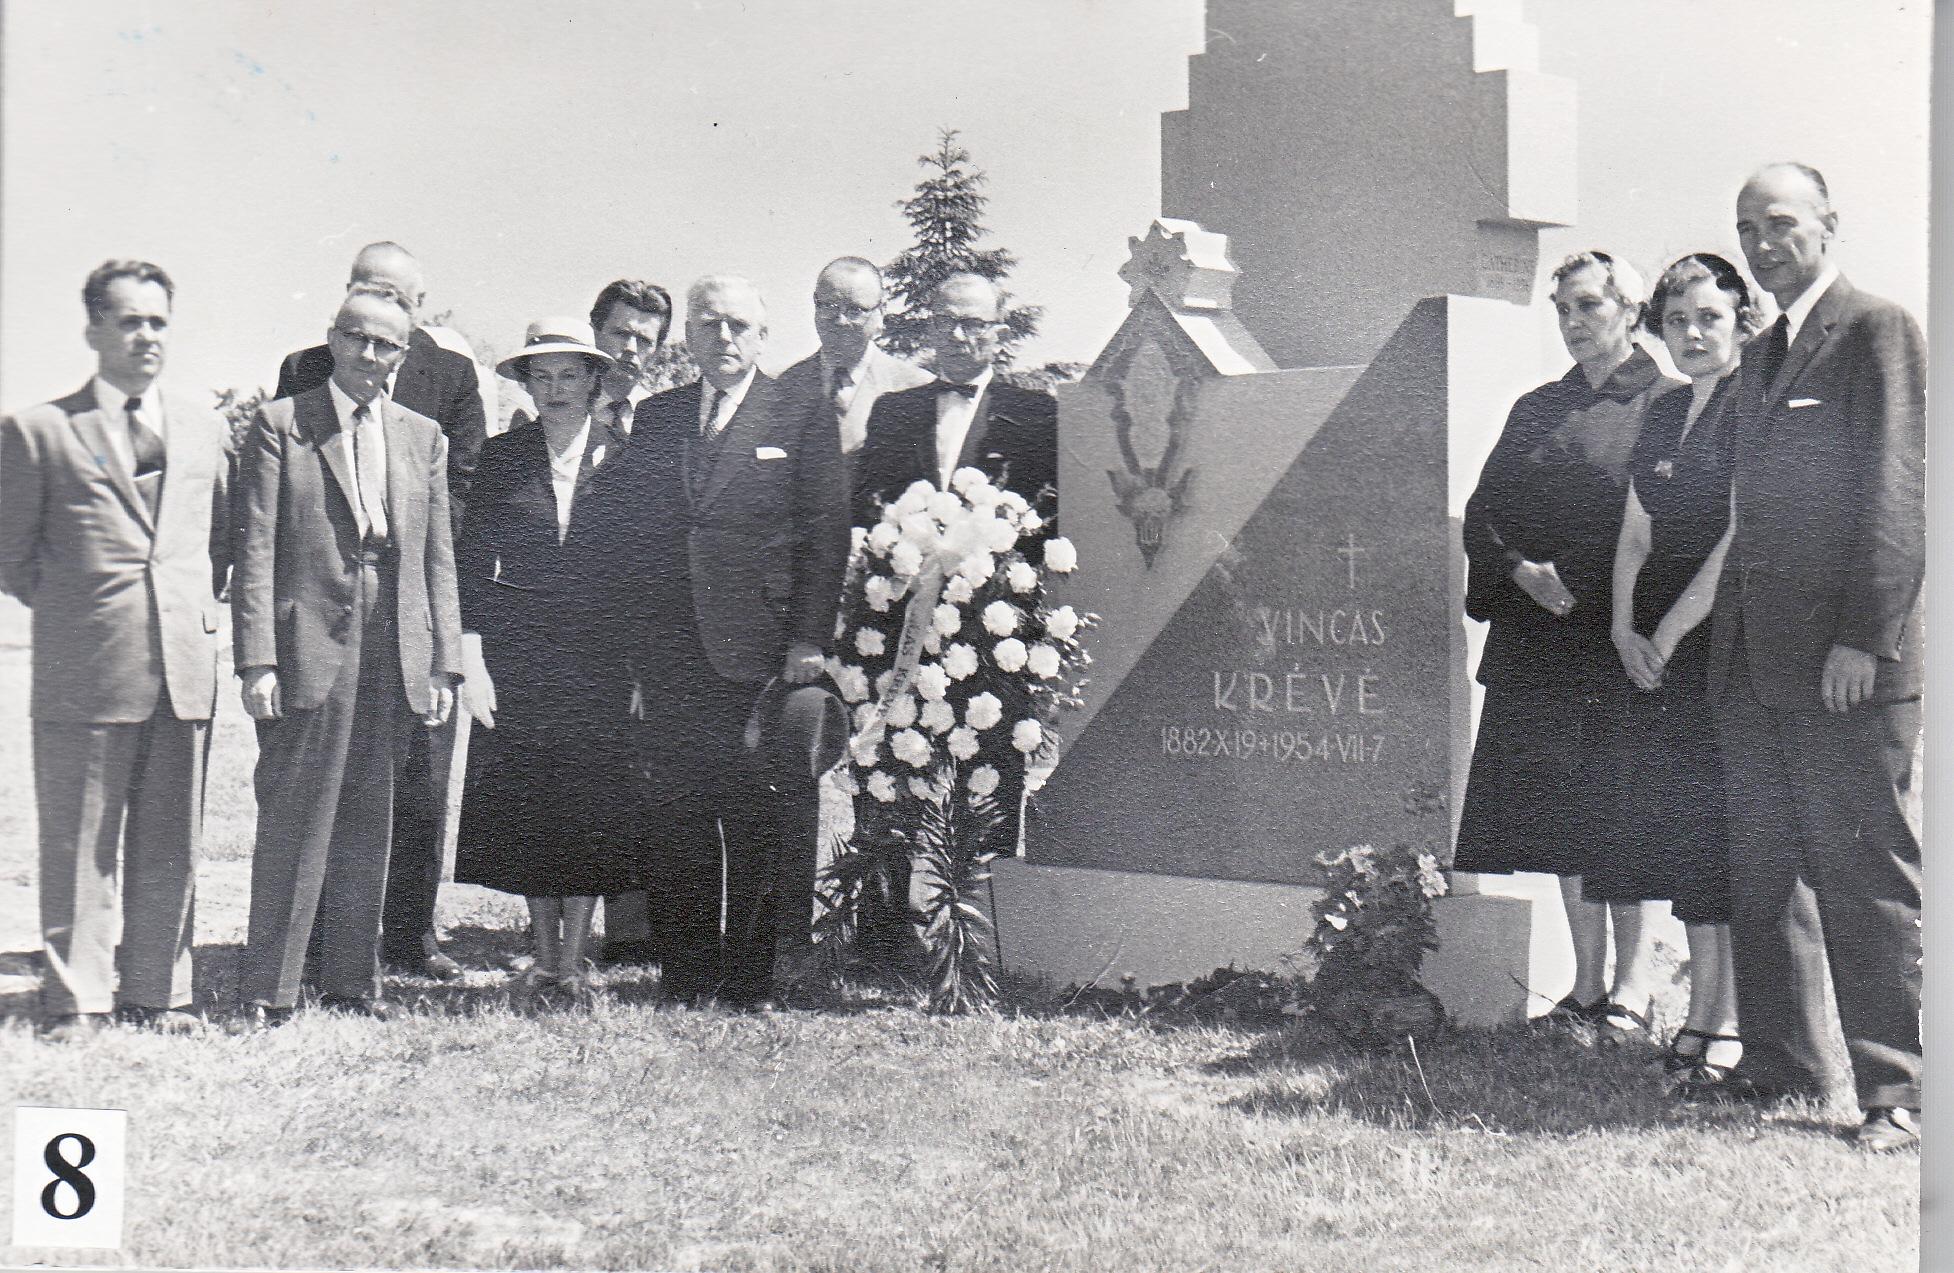 V. Krėvės mirties metinės, 1955 m., Filadelfija      V. Krėvės memorialinio muziejaus nuotr.